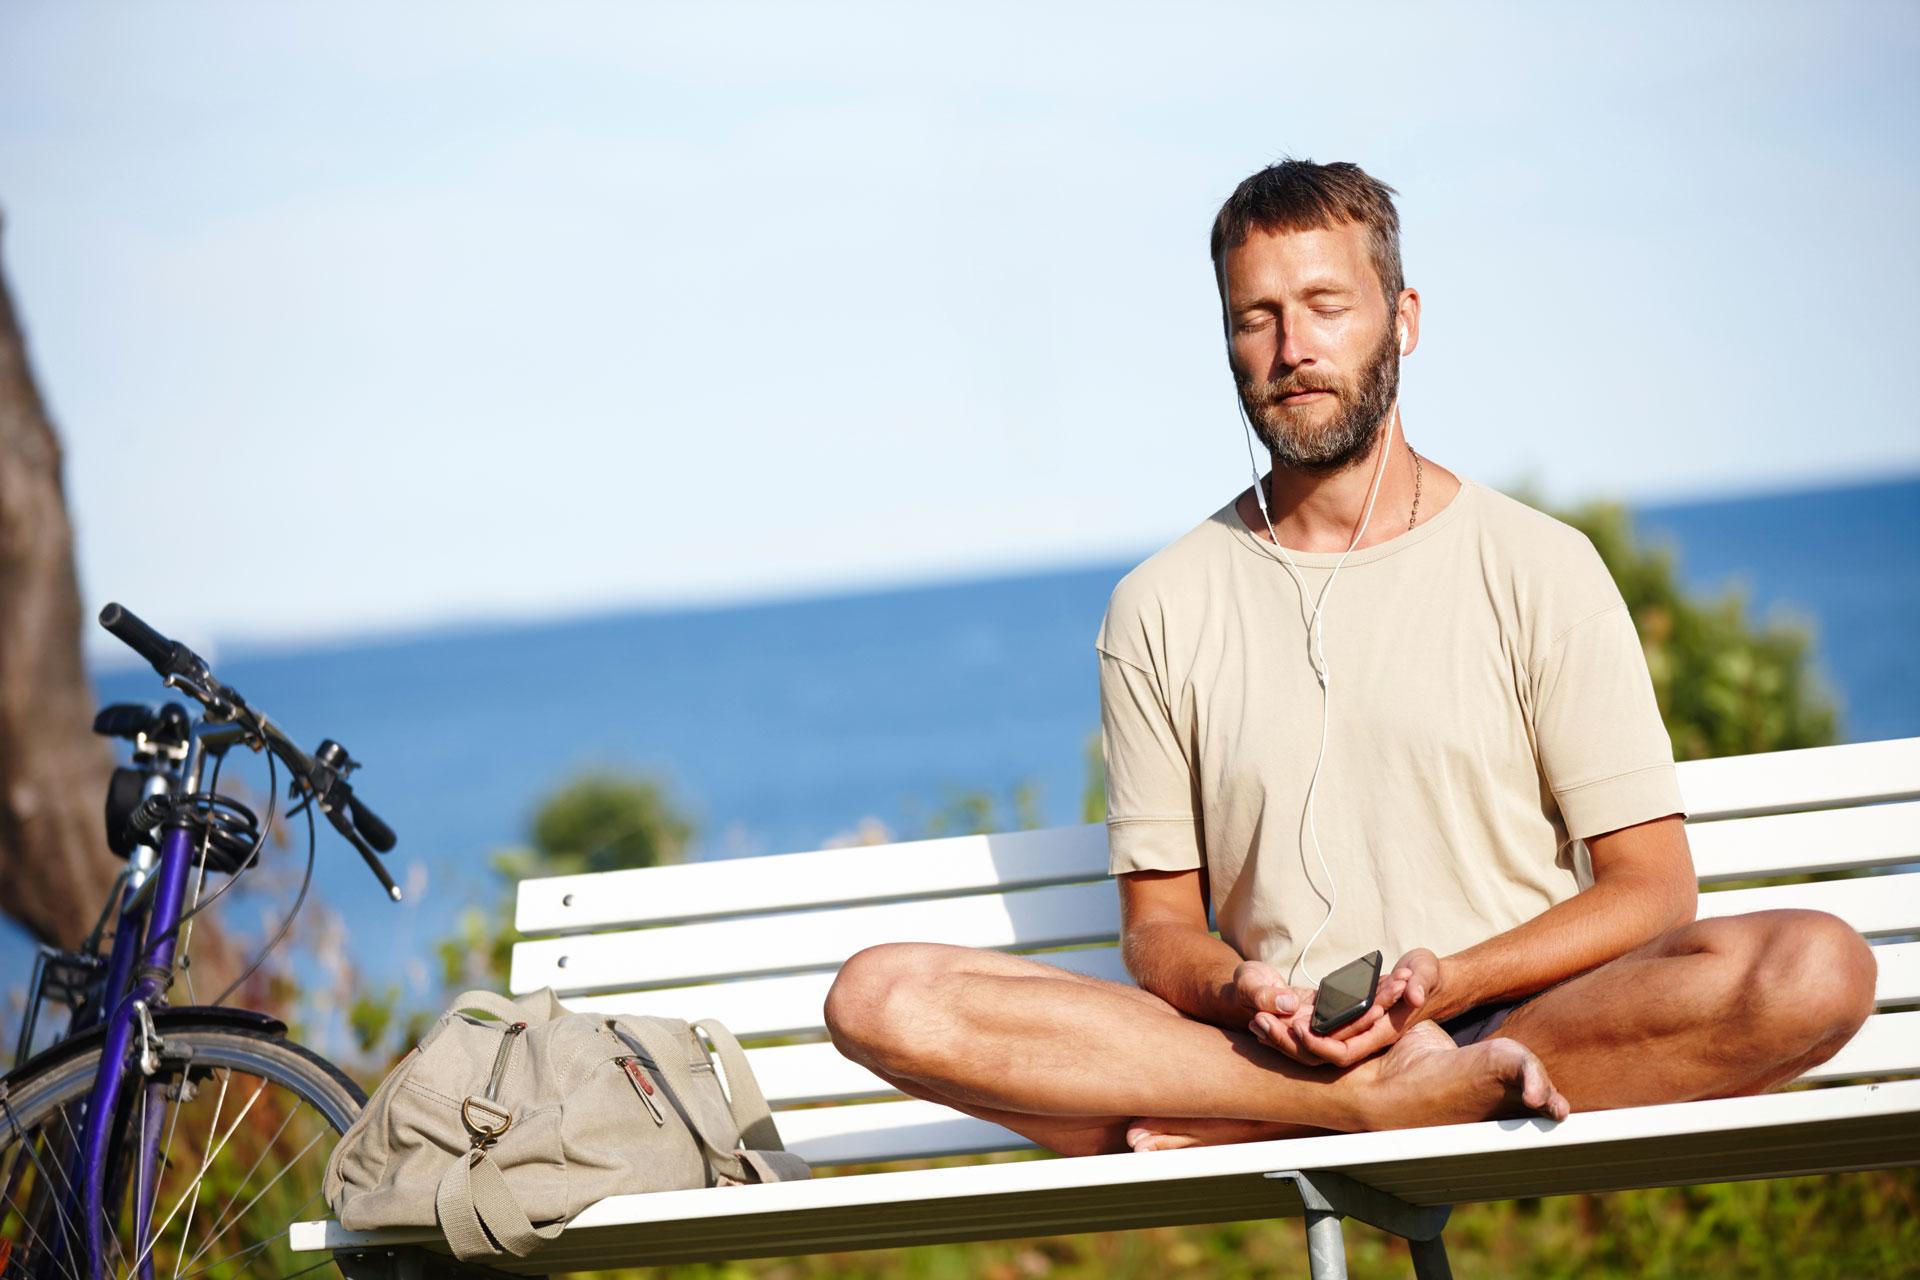 man-on-bench-53295618_web